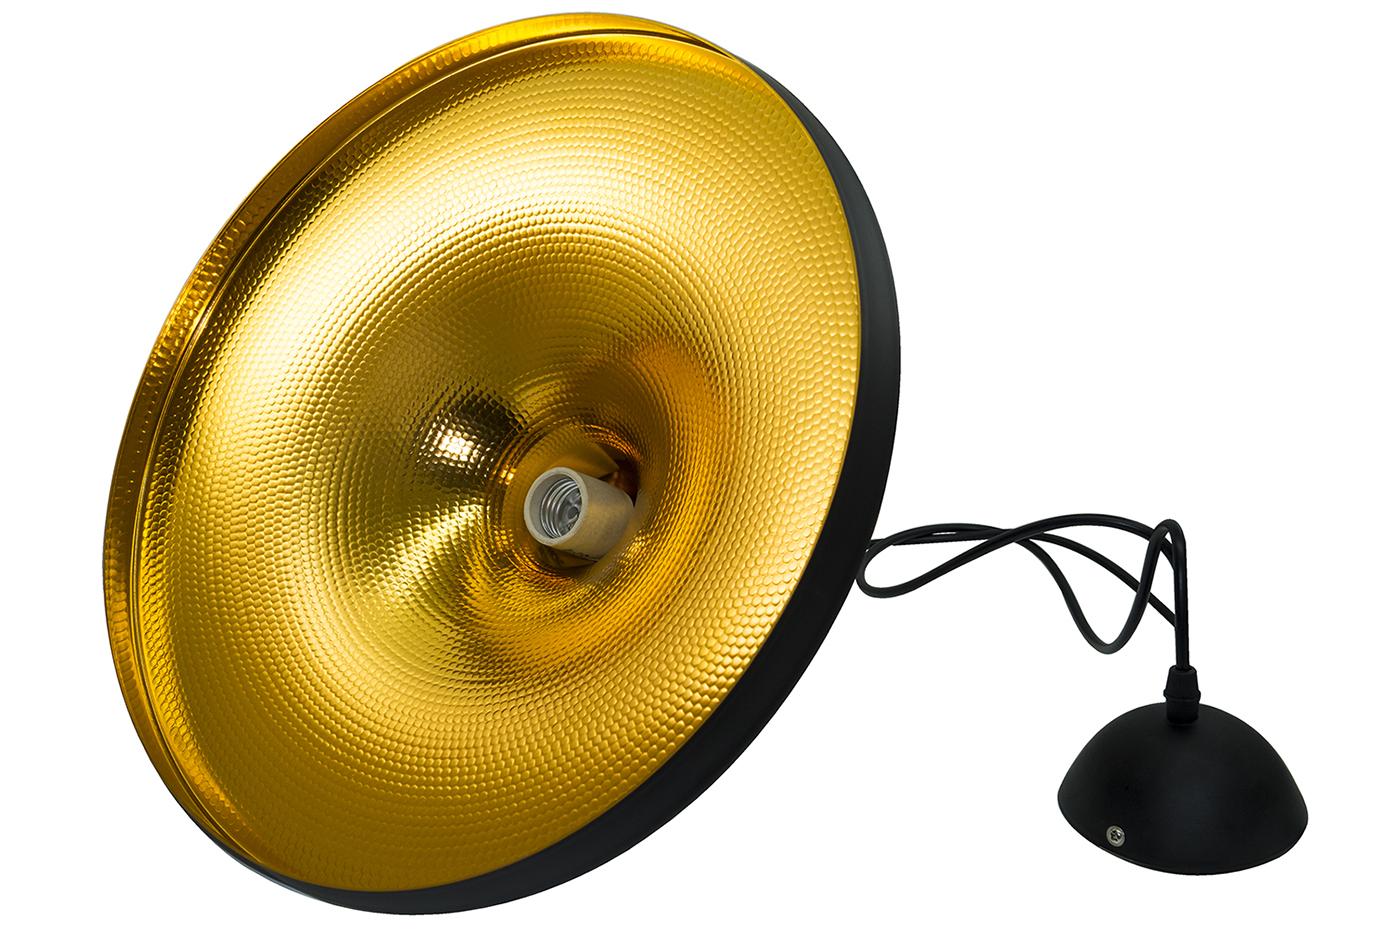 Bes 20541 lampadari beselettronica lampadario lampada applique